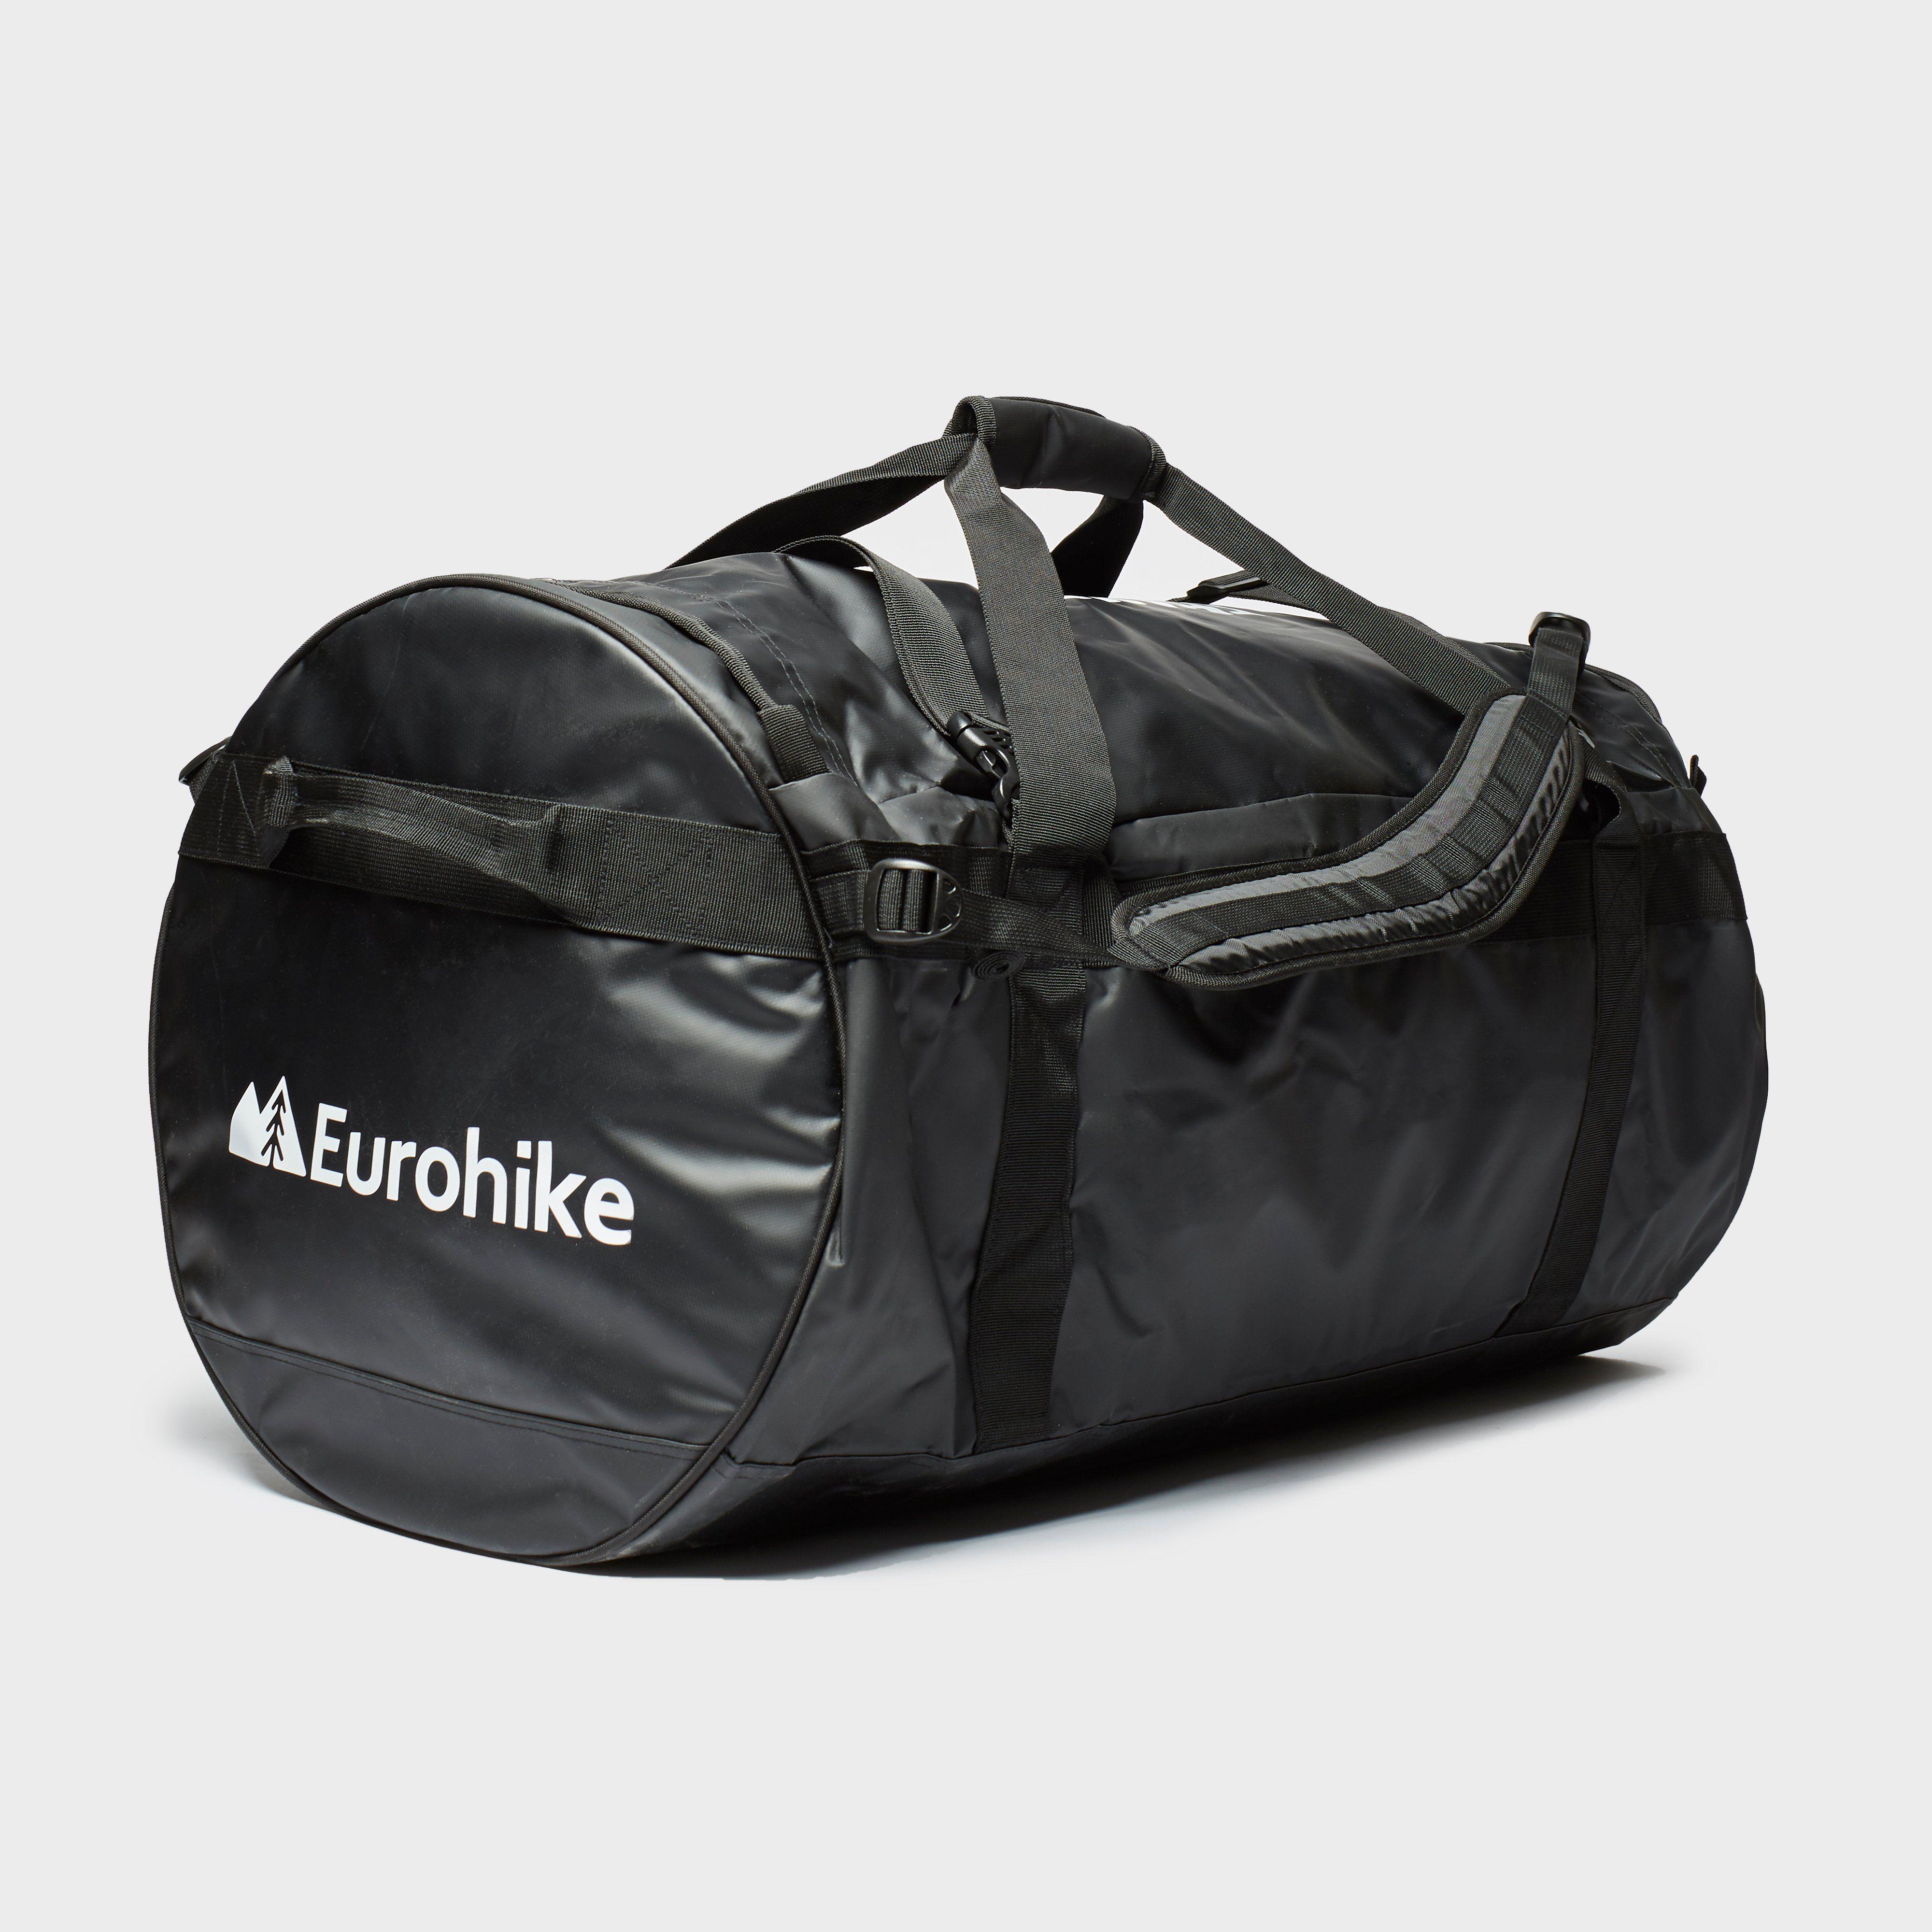 EUROHIKE Transit 120L Cargo Bag